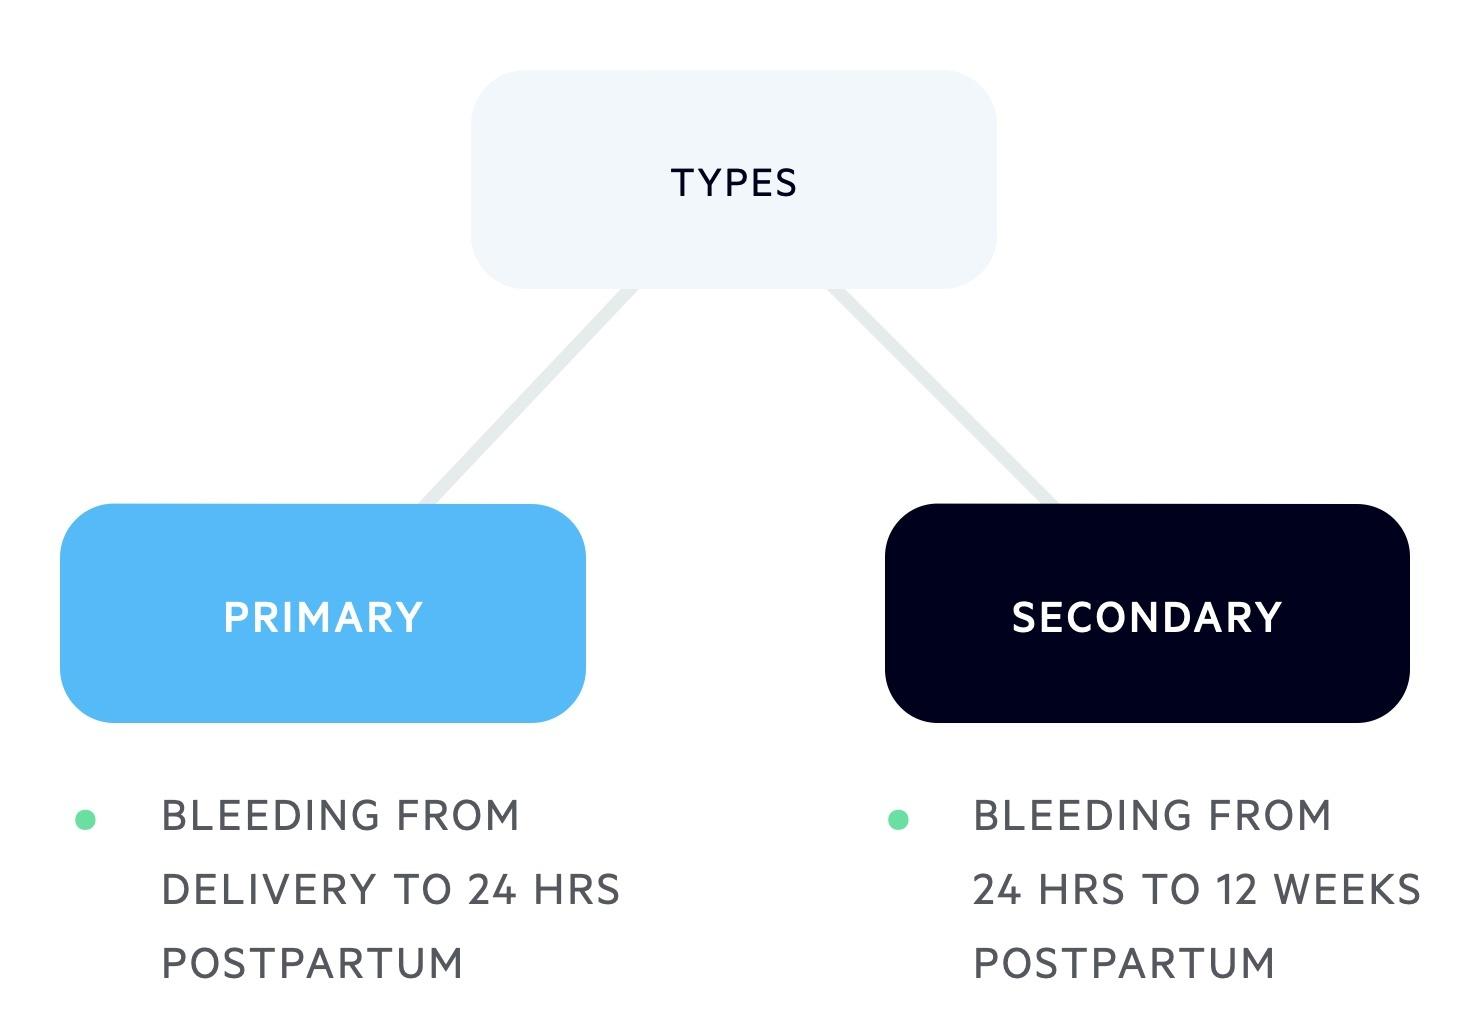 Types of PPH